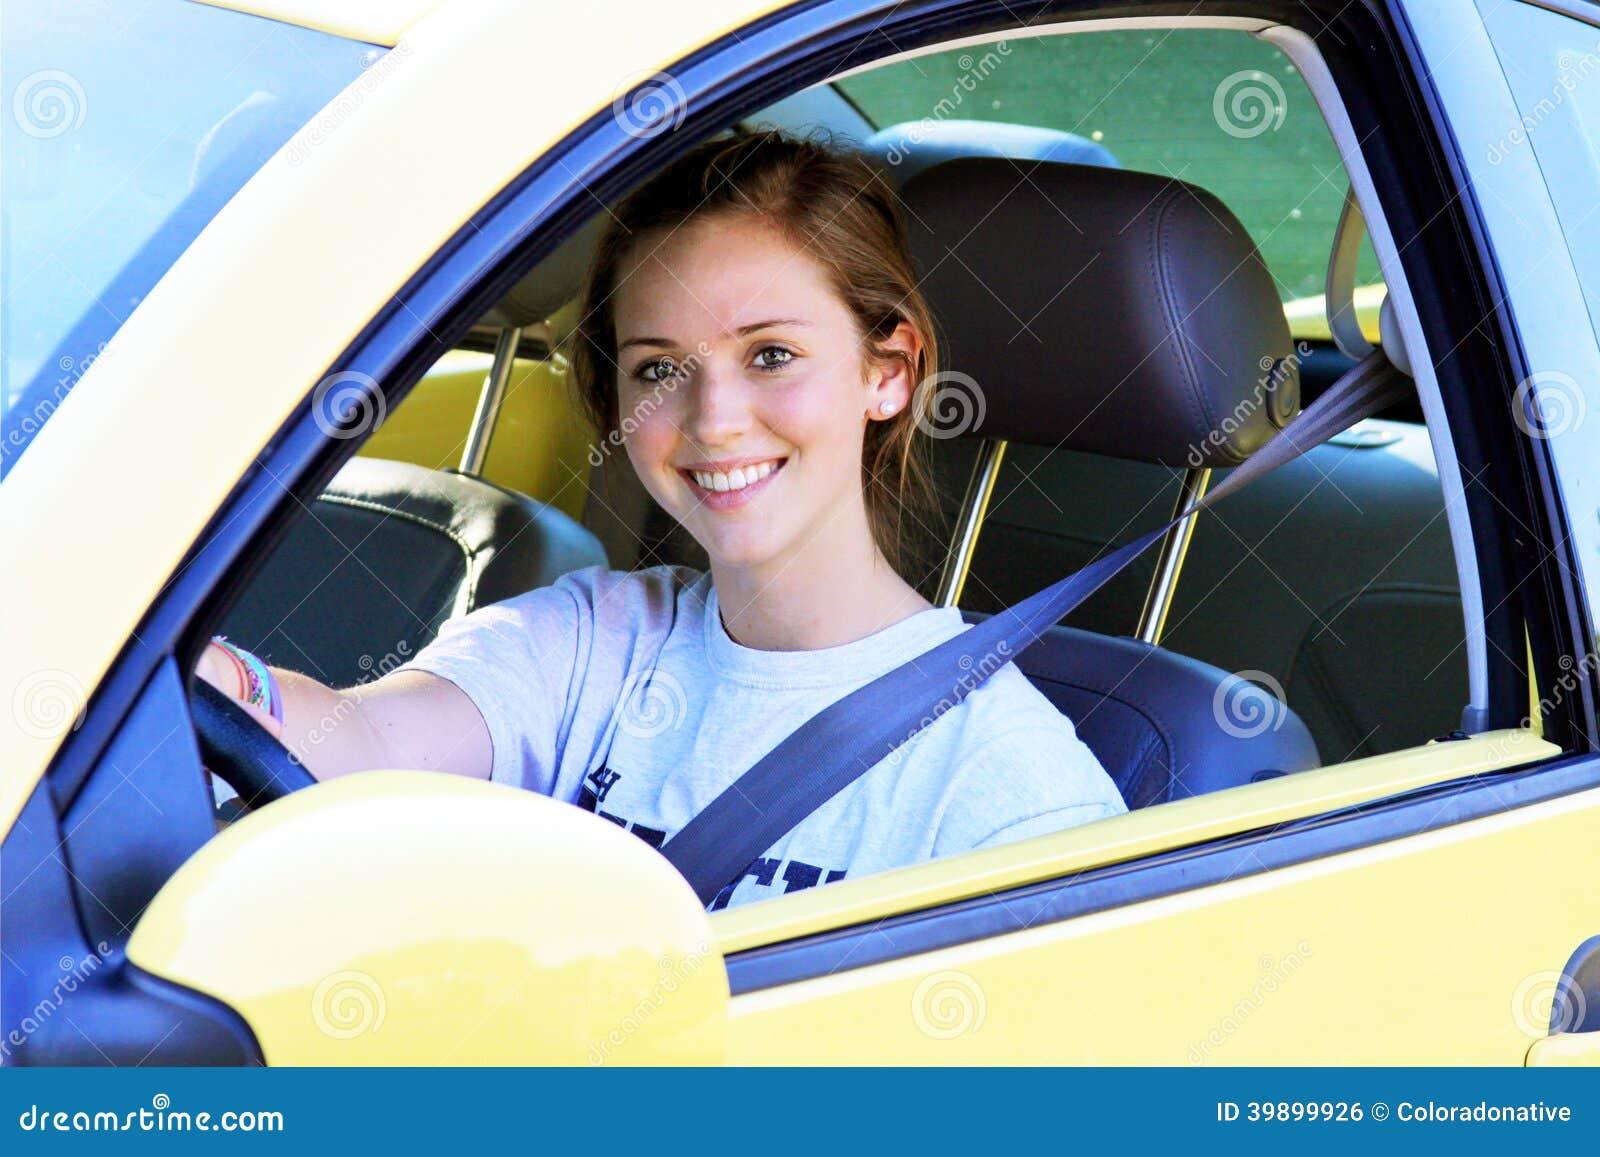 Autista teenager in automobile